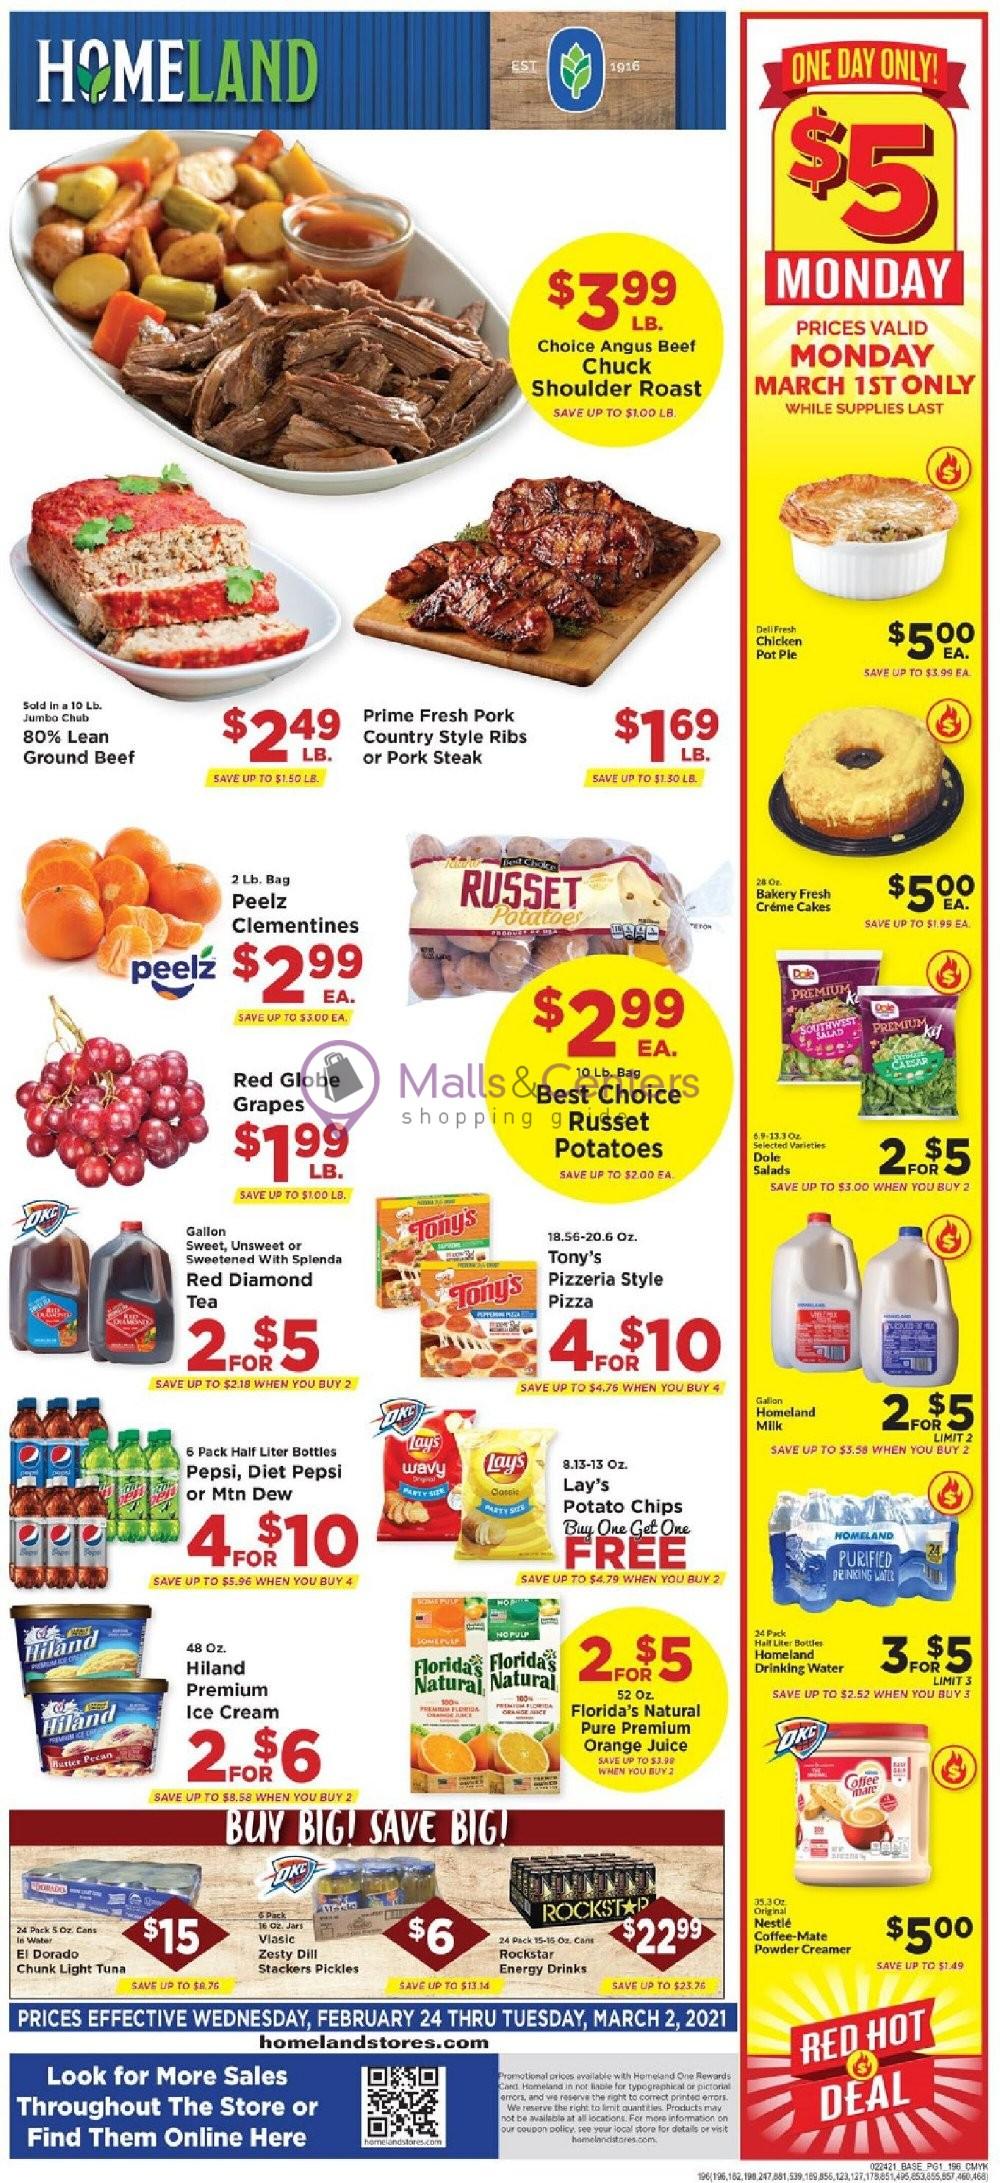 weekly ads Food Pyramid - page 1 - mallscenters.com